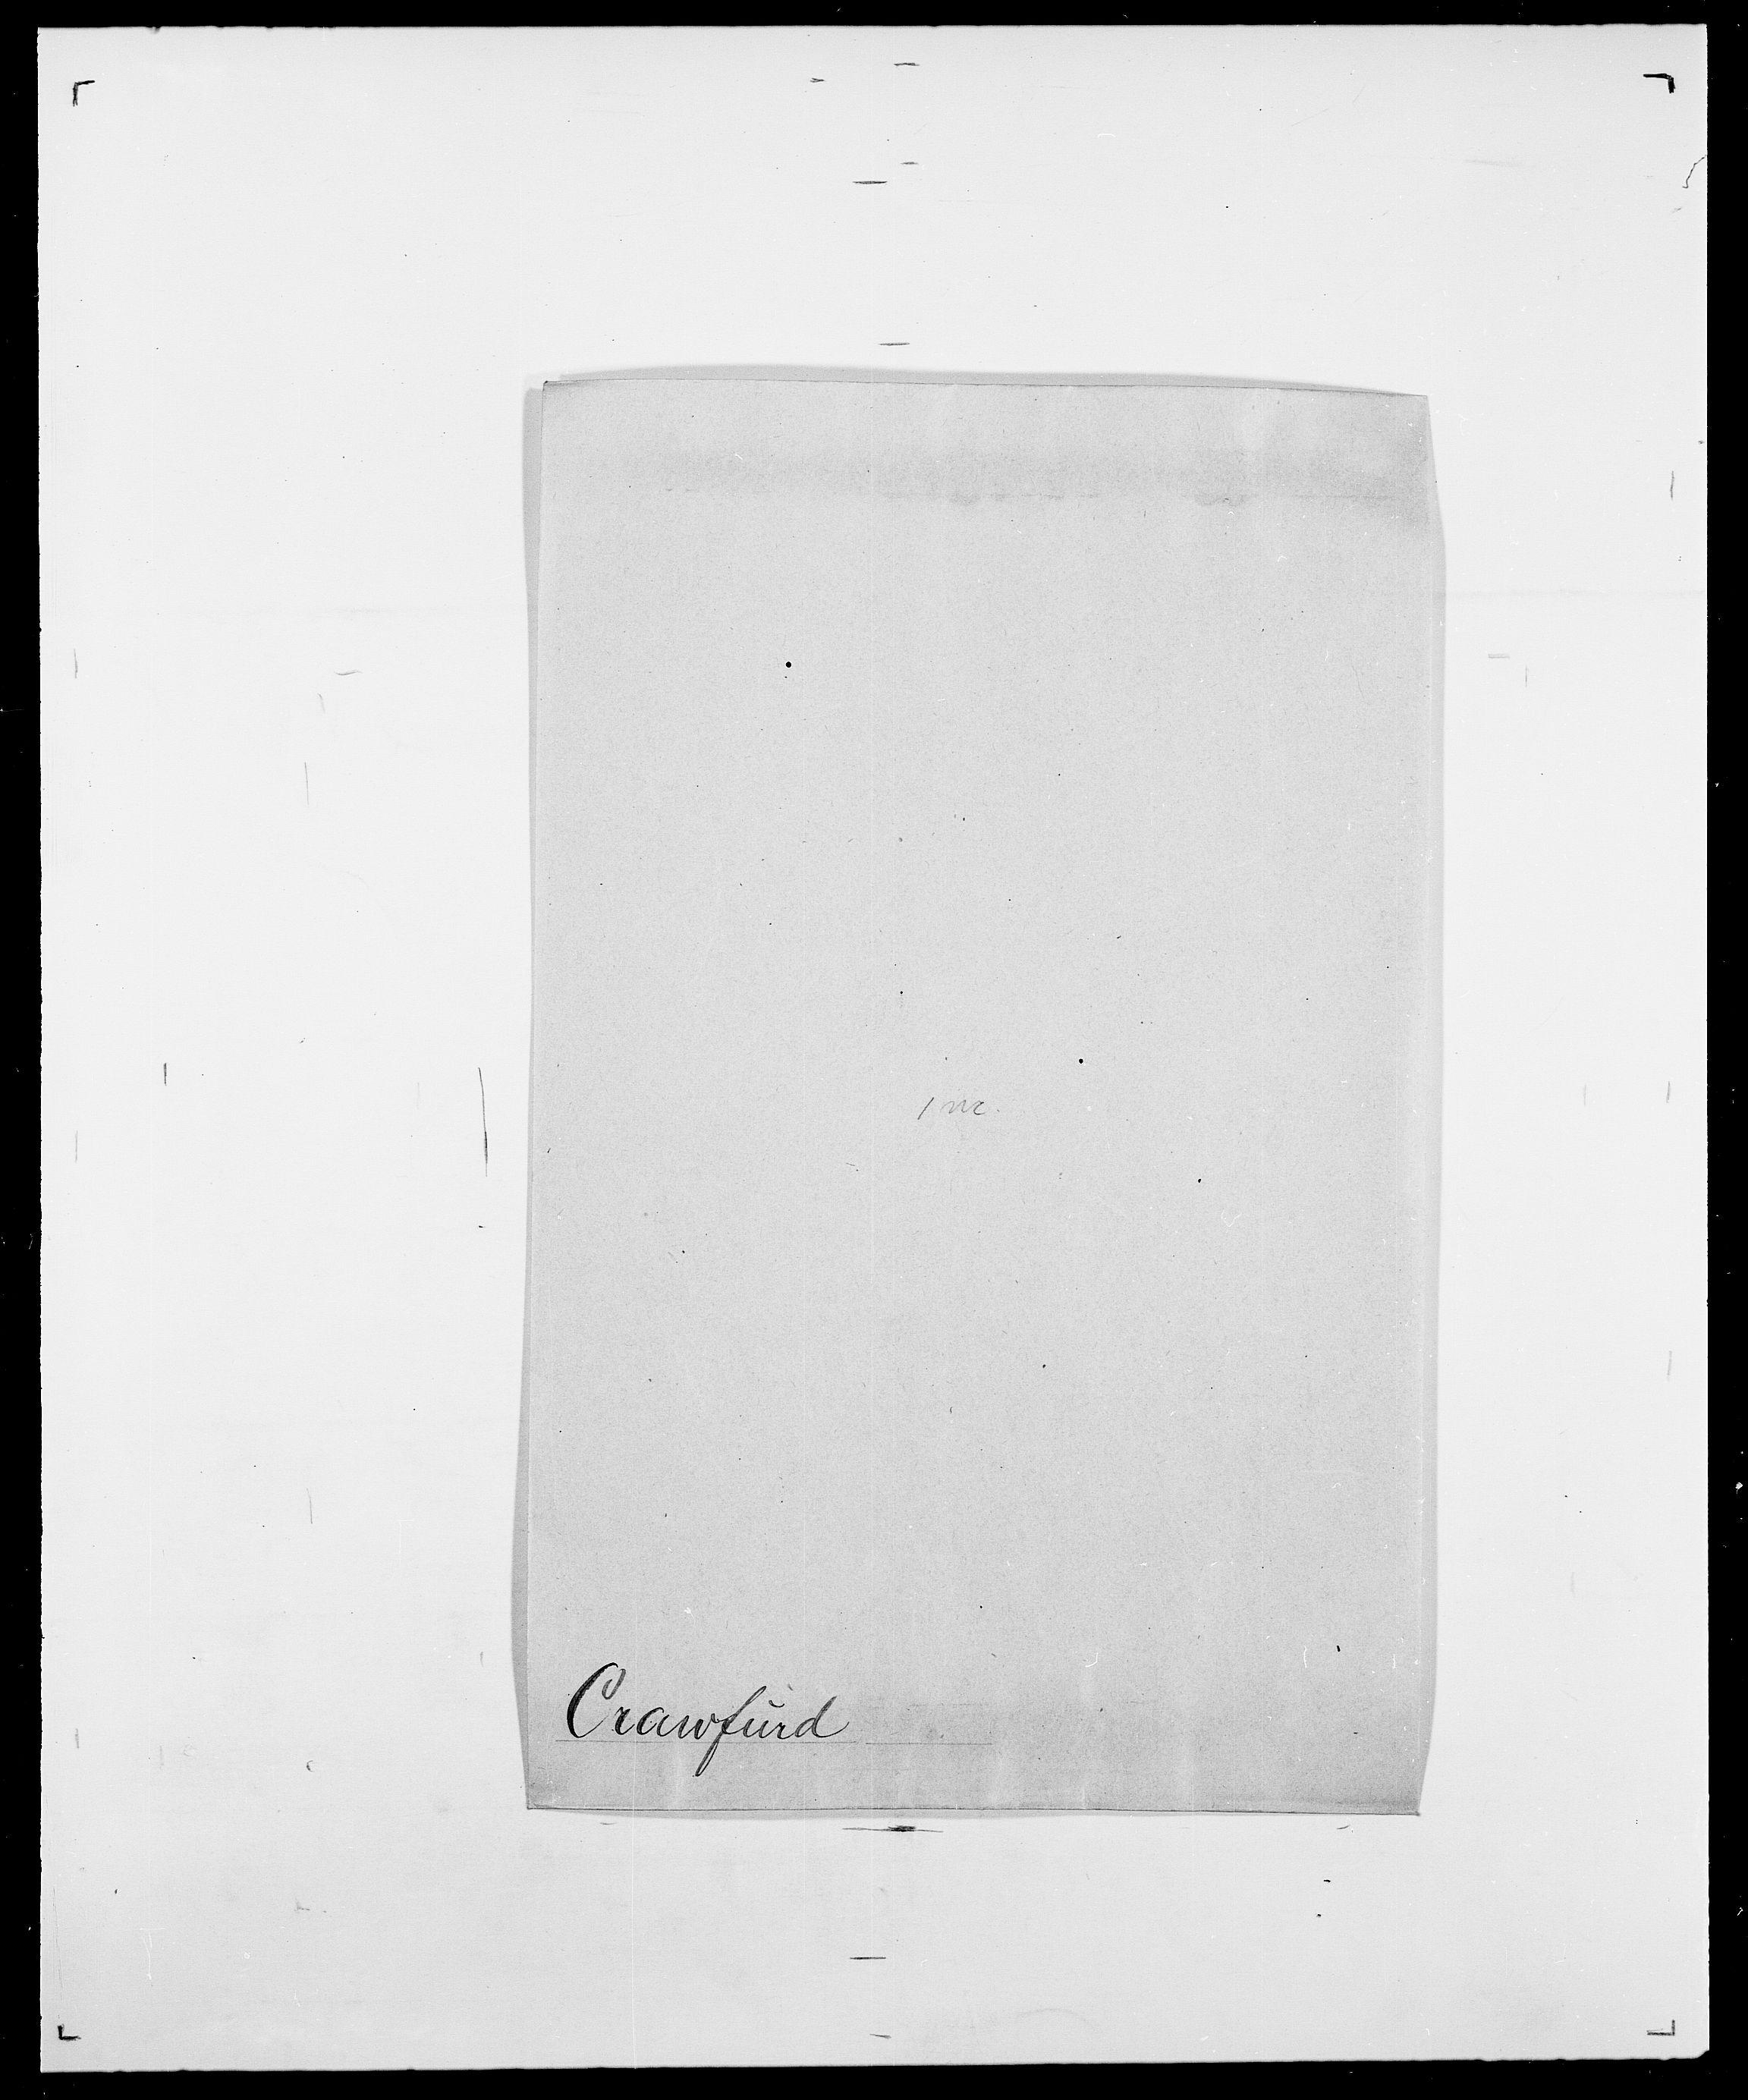 SAO, Delgobe, Charles Antoine - samling, D/Da/L0008: Capjon - Dagenbolt, s. 596